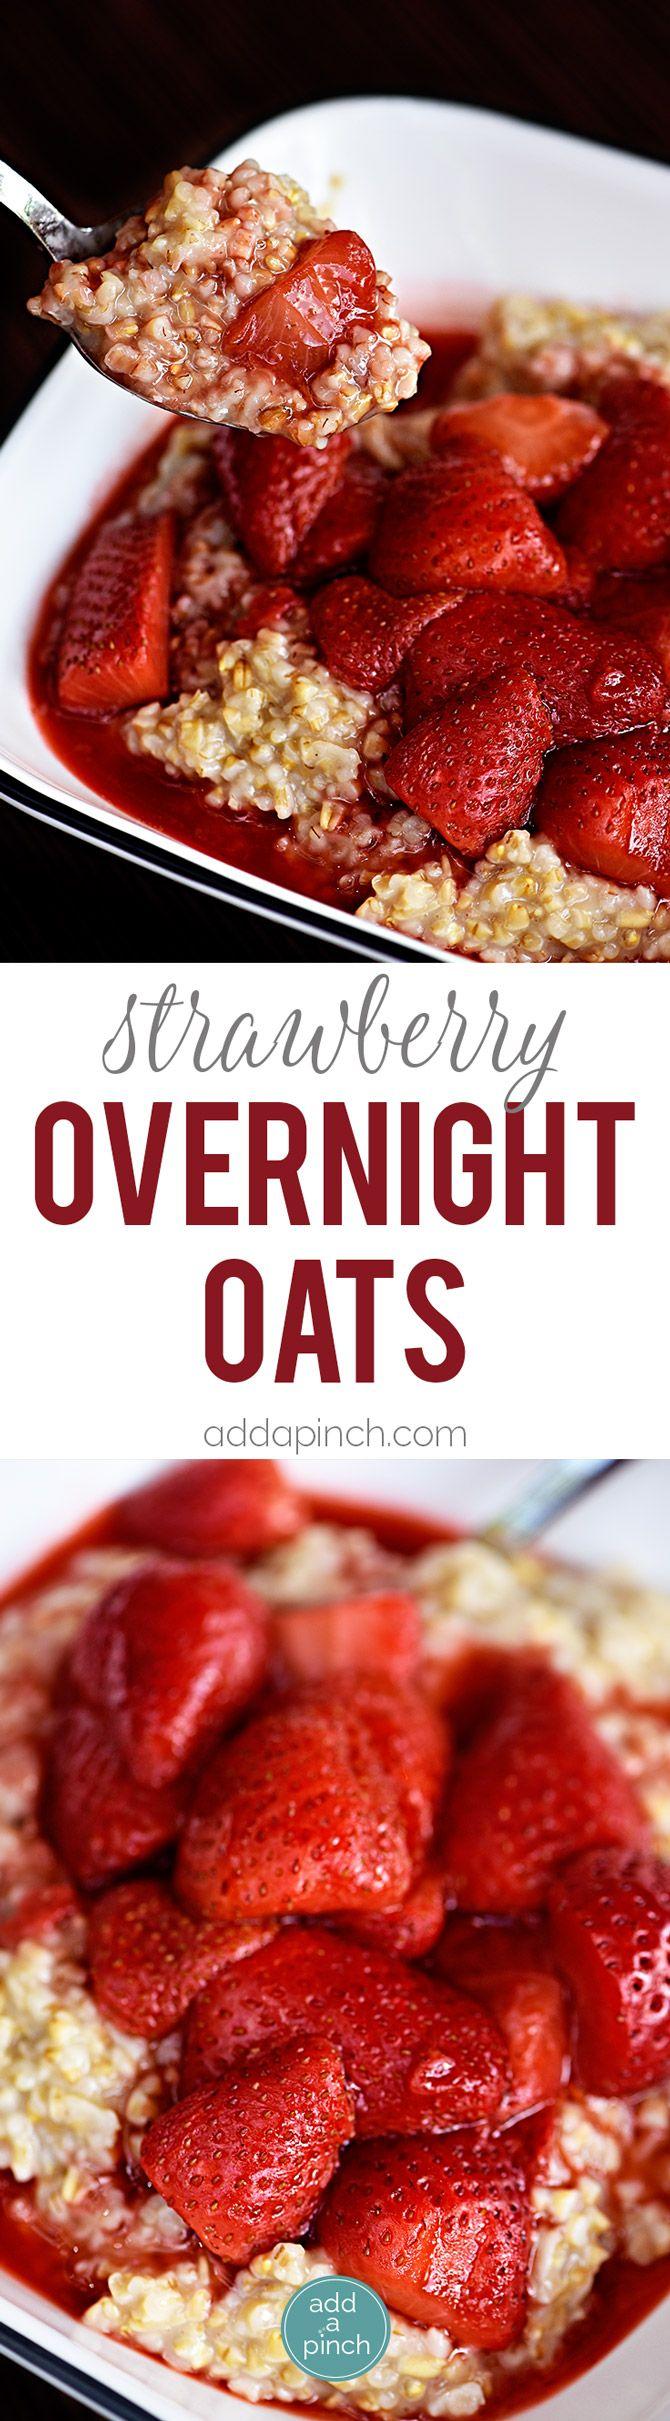 about Strawberry Overnight Oats on Pinterest | Overnight Oats, Oats ...